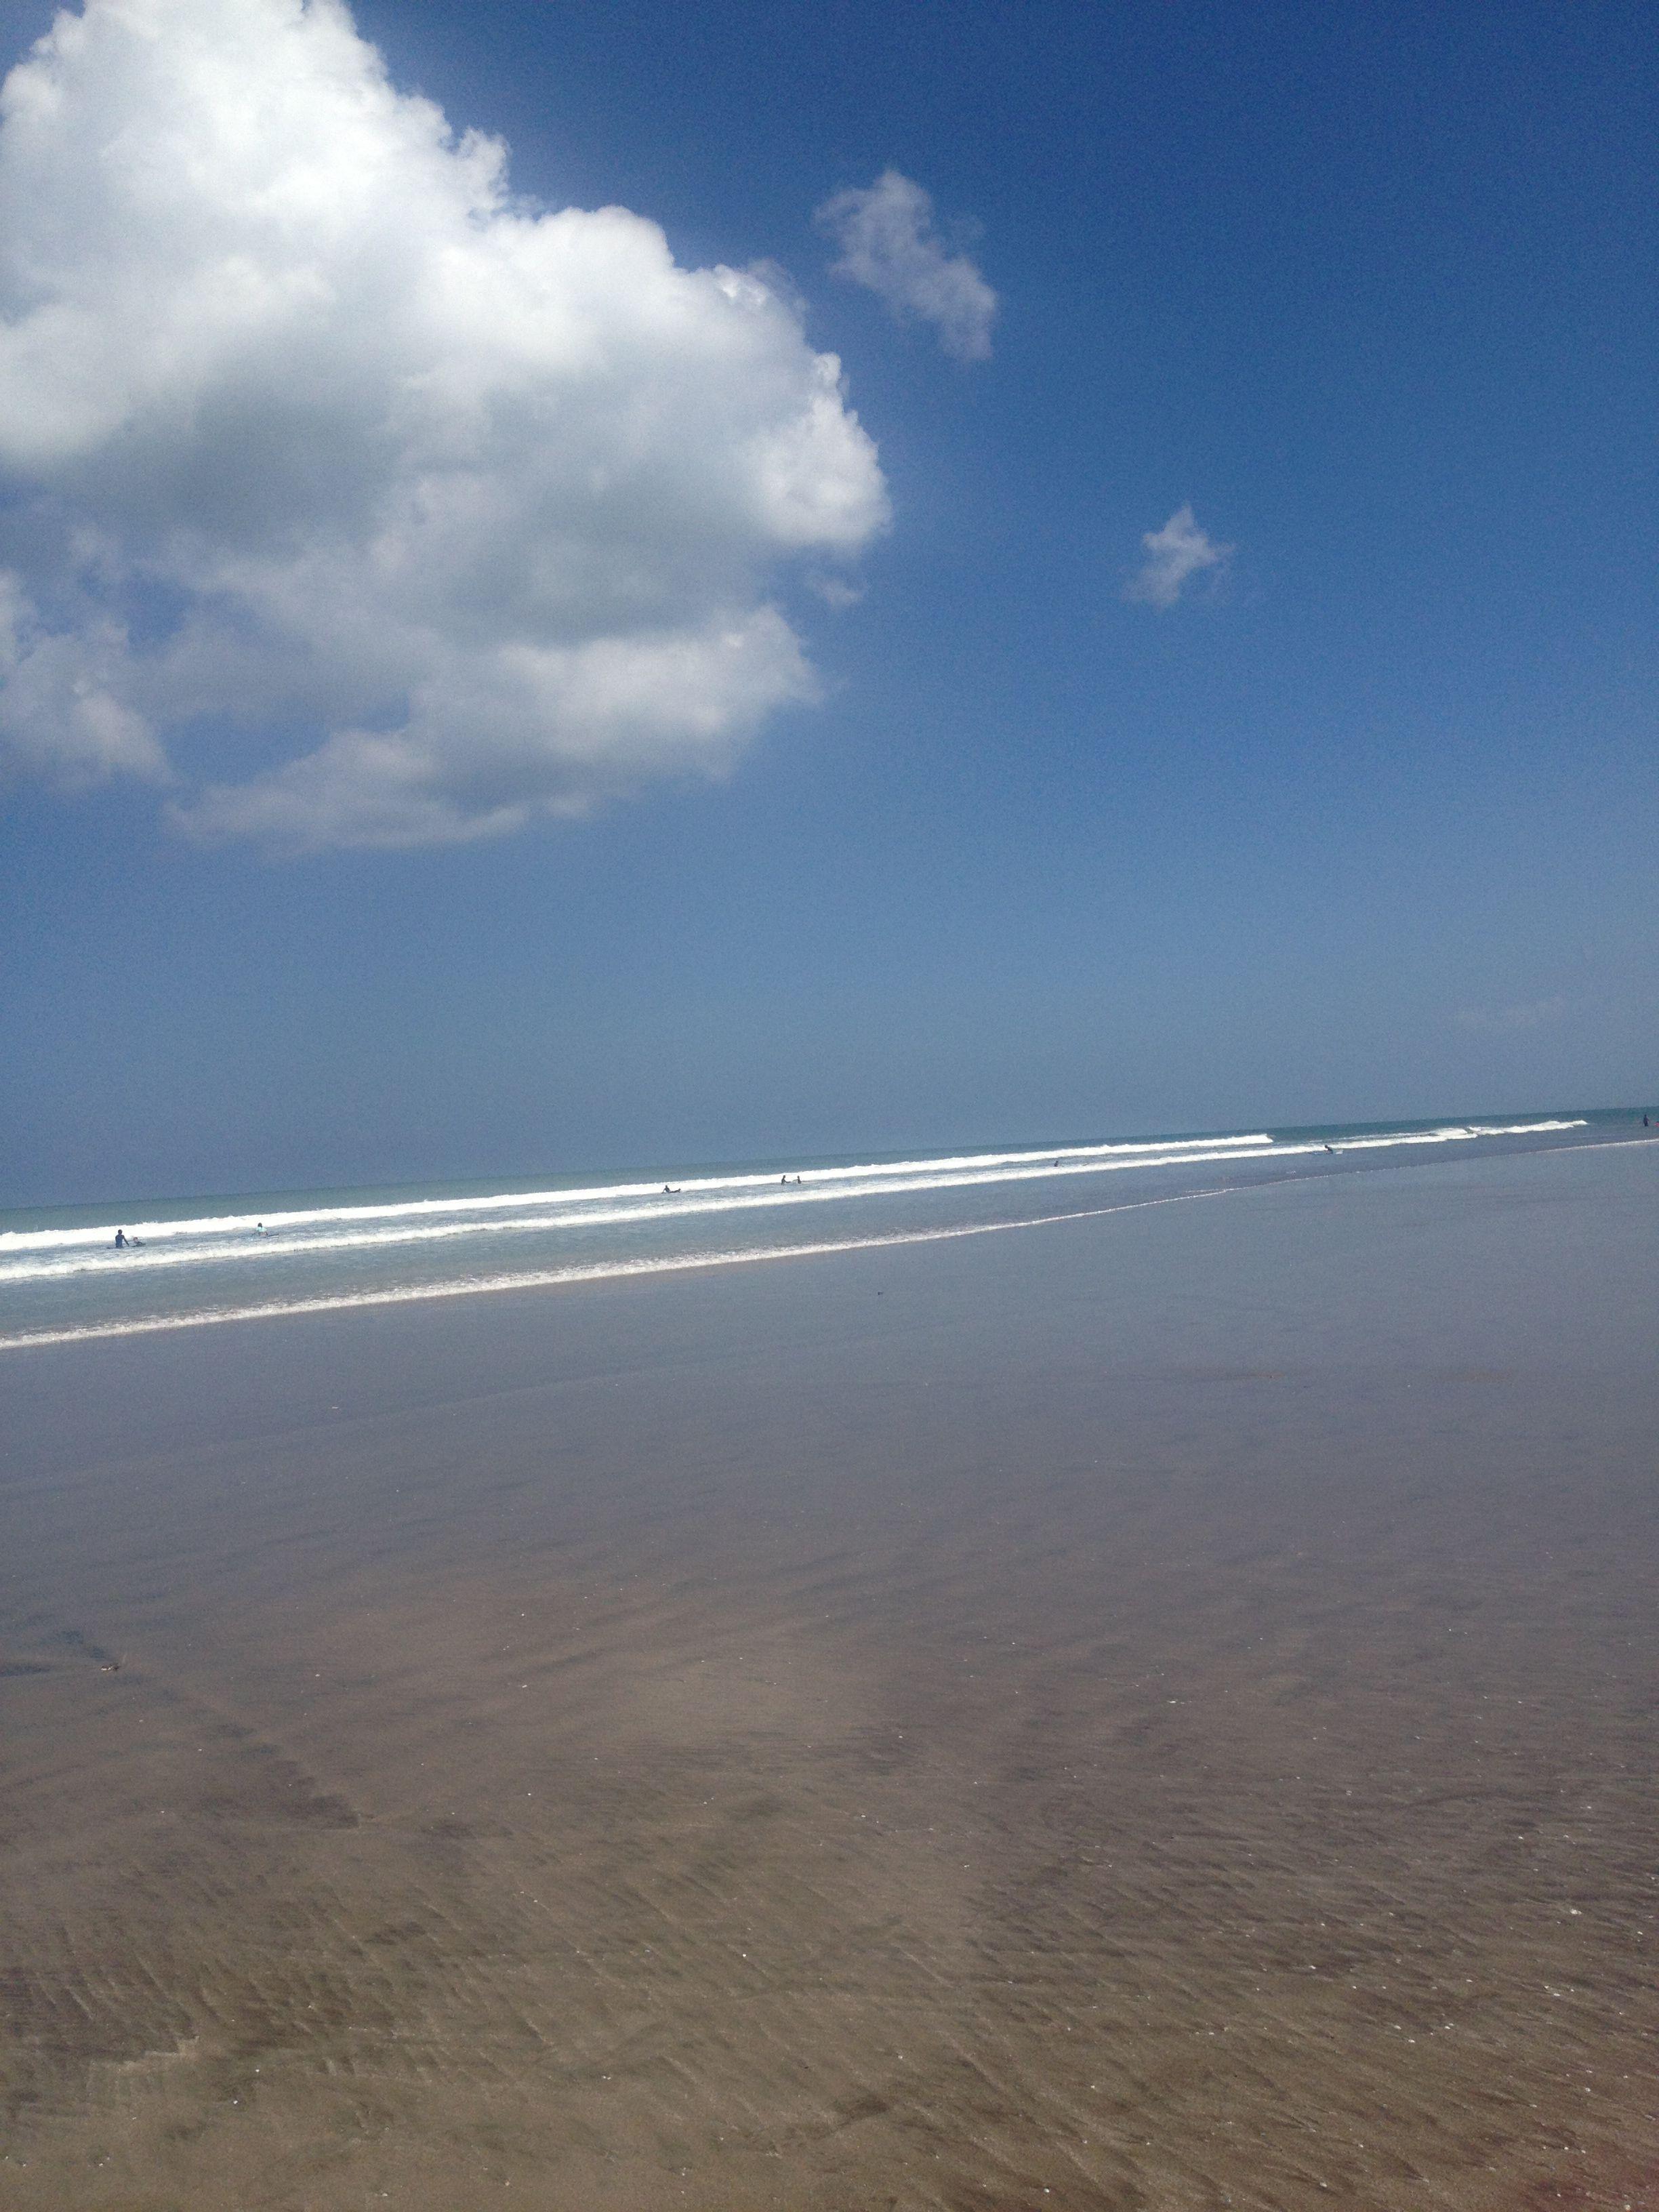 Legian beach // Seminyak, Bali - Photo by: Monica Roenning